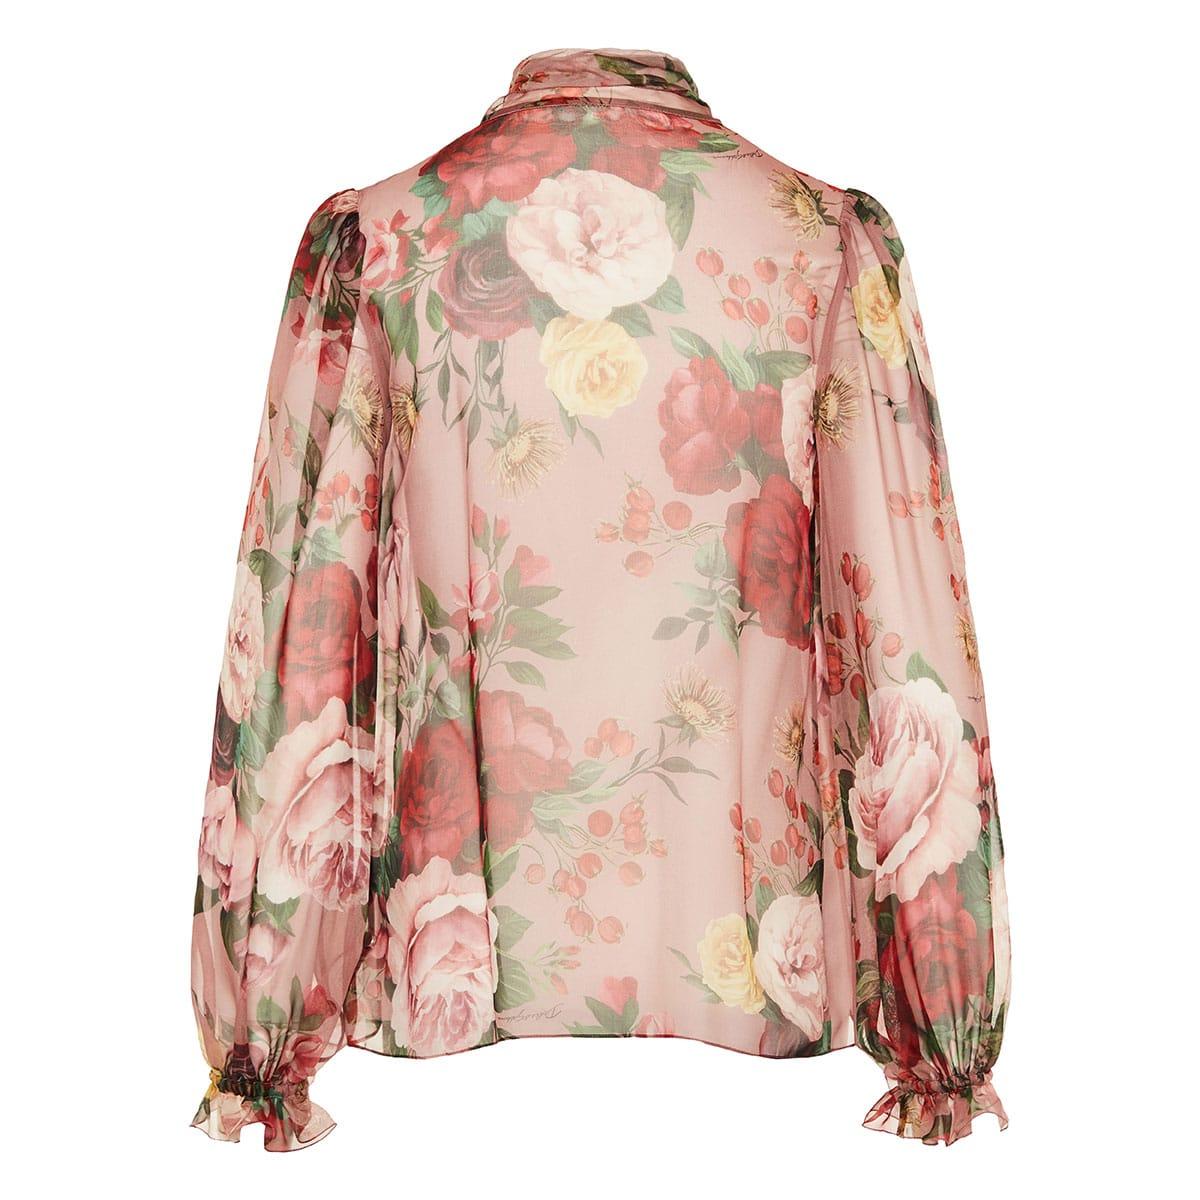 Bow-tie floral chiffon blouse